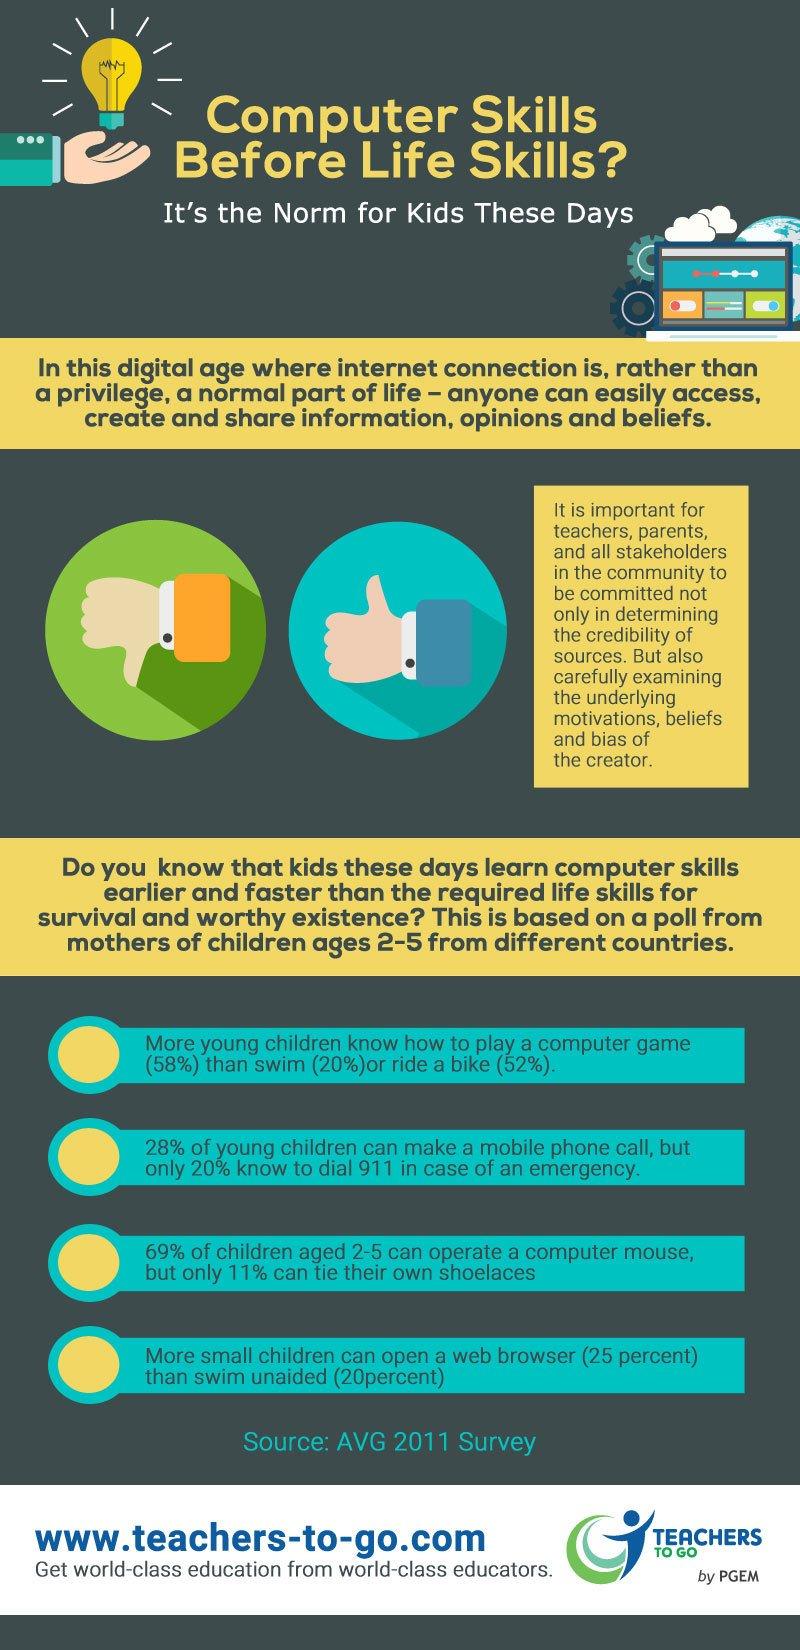 computer skills before life skills infographic e learning computer skills before life skills infographic